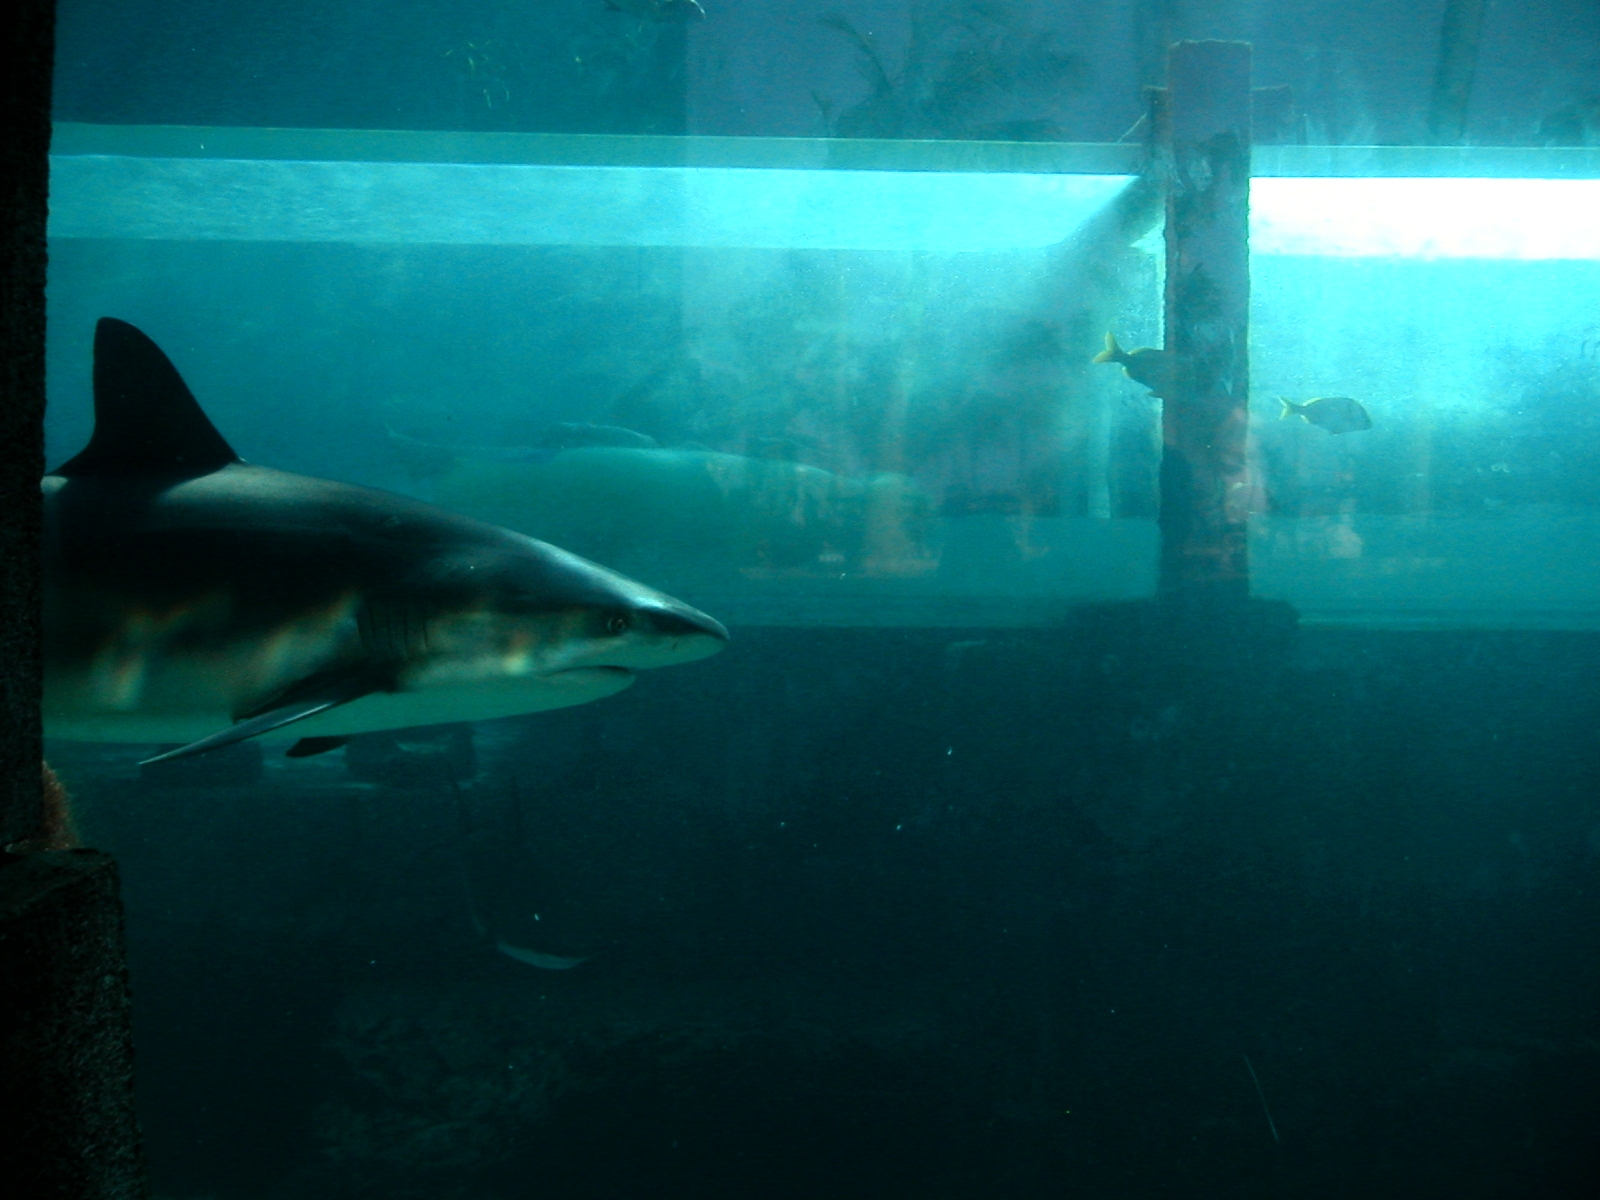 filecarcharhinus perezi at mayan temple slides atlantisjpg underwater water slide atlantis j35 underwater